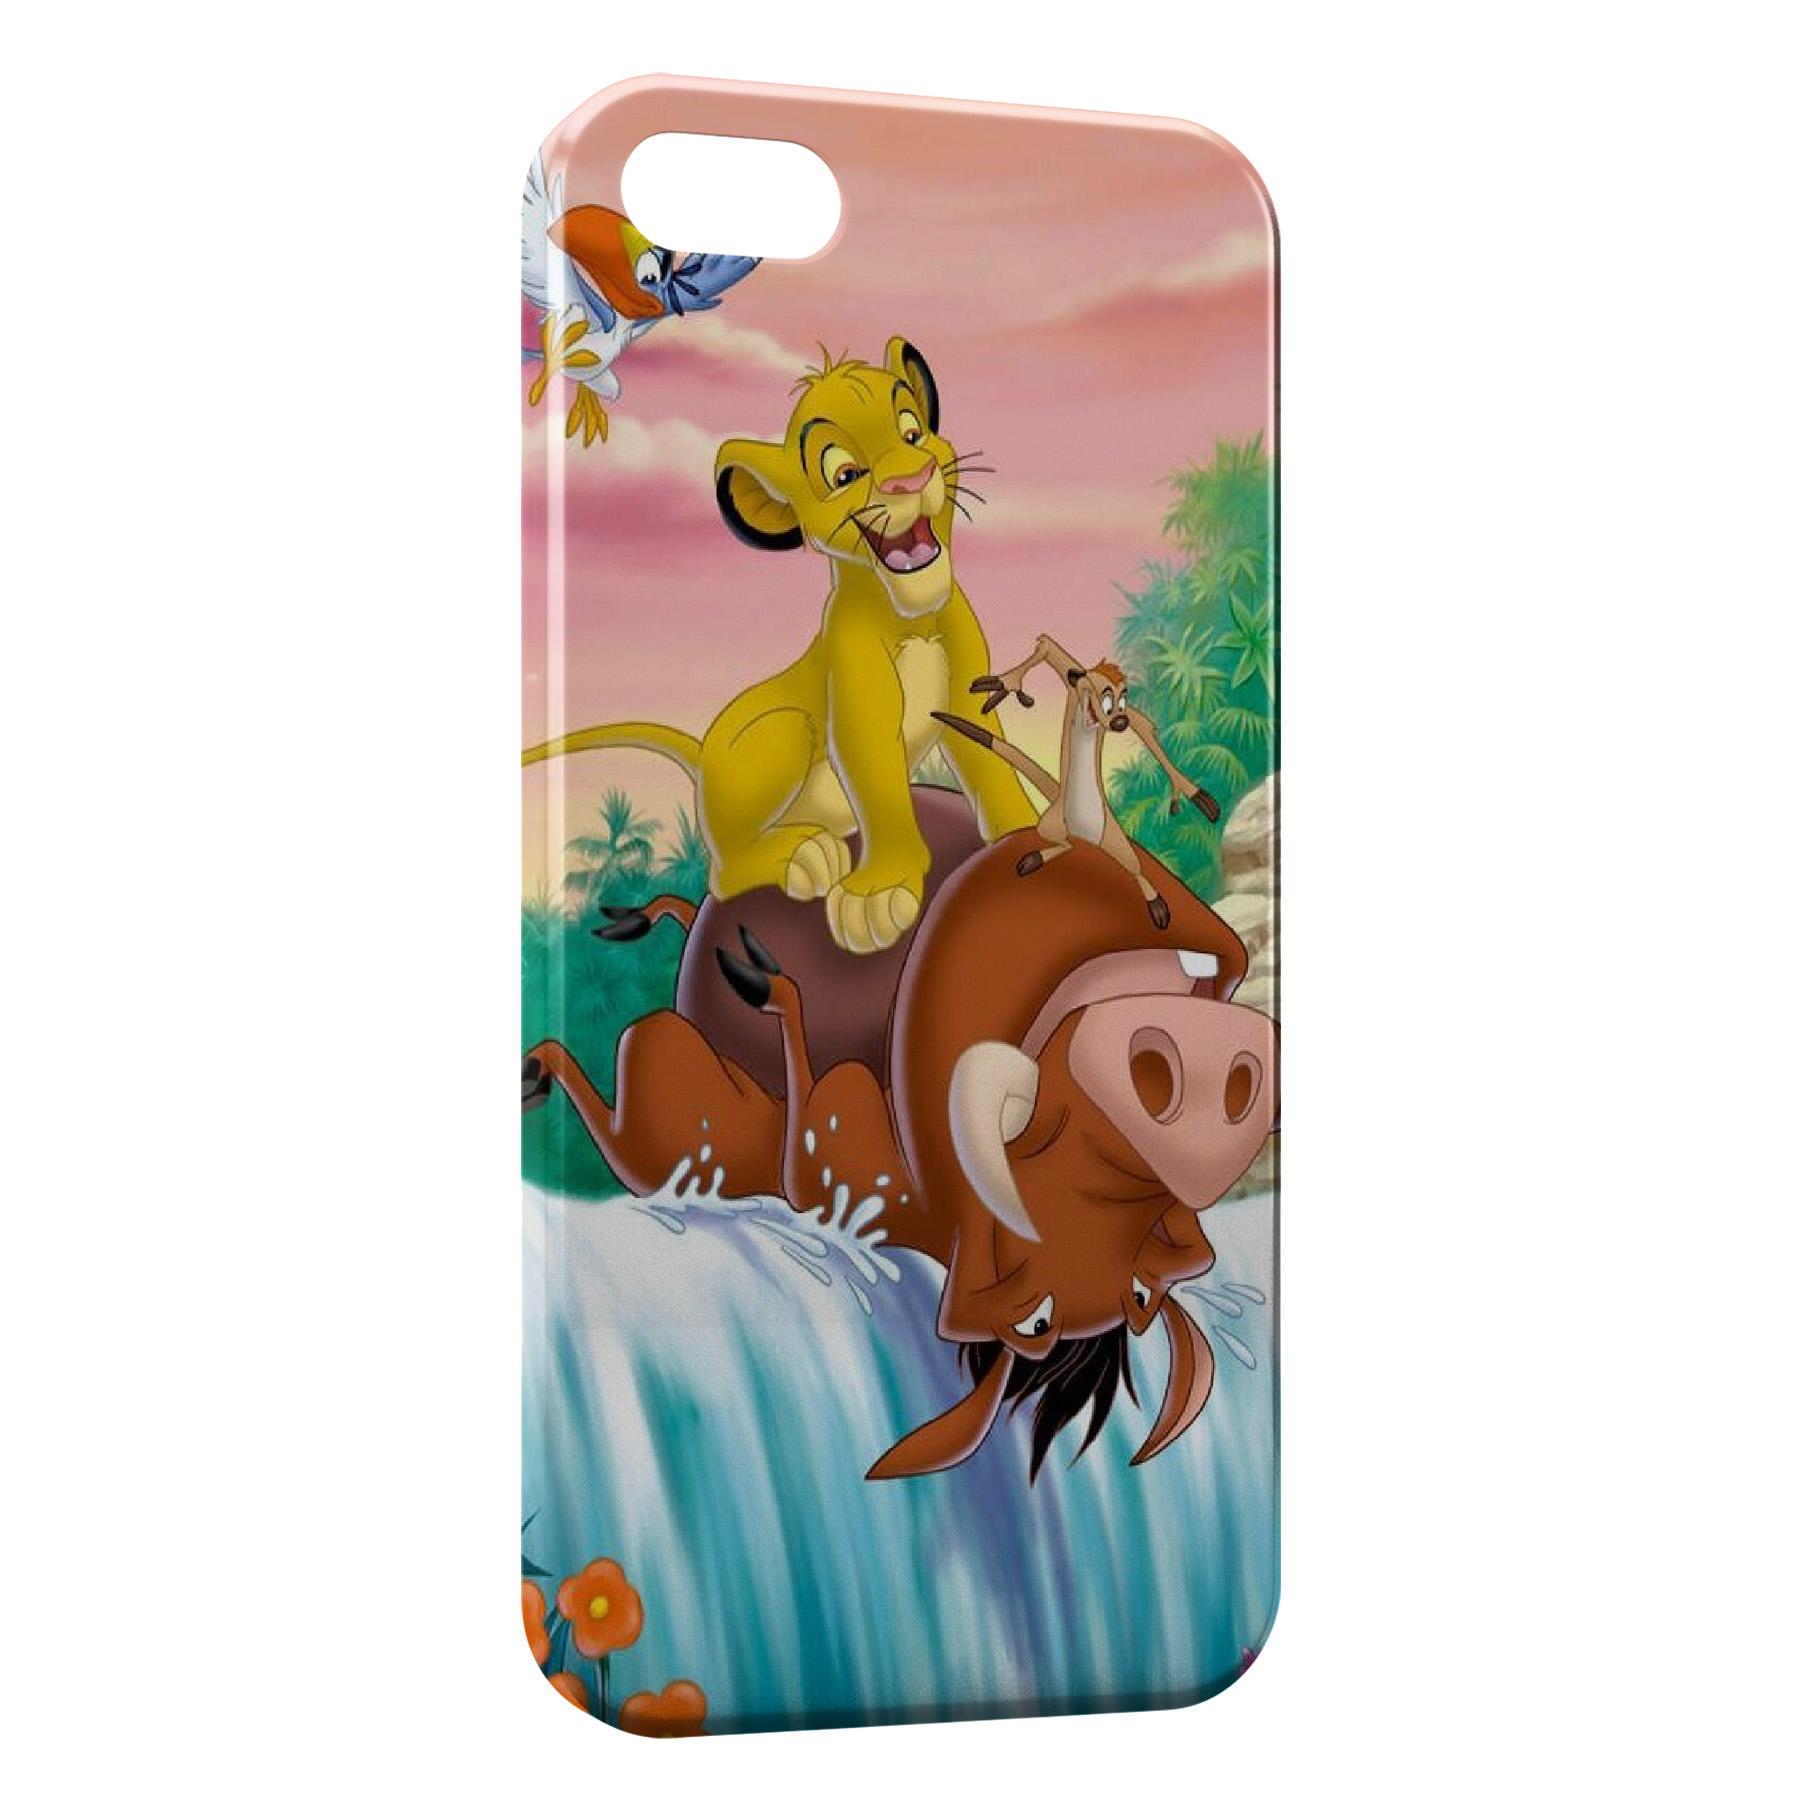 Coque iPhone 4 4S Simba Timon Pumba Le Roi Lion 2